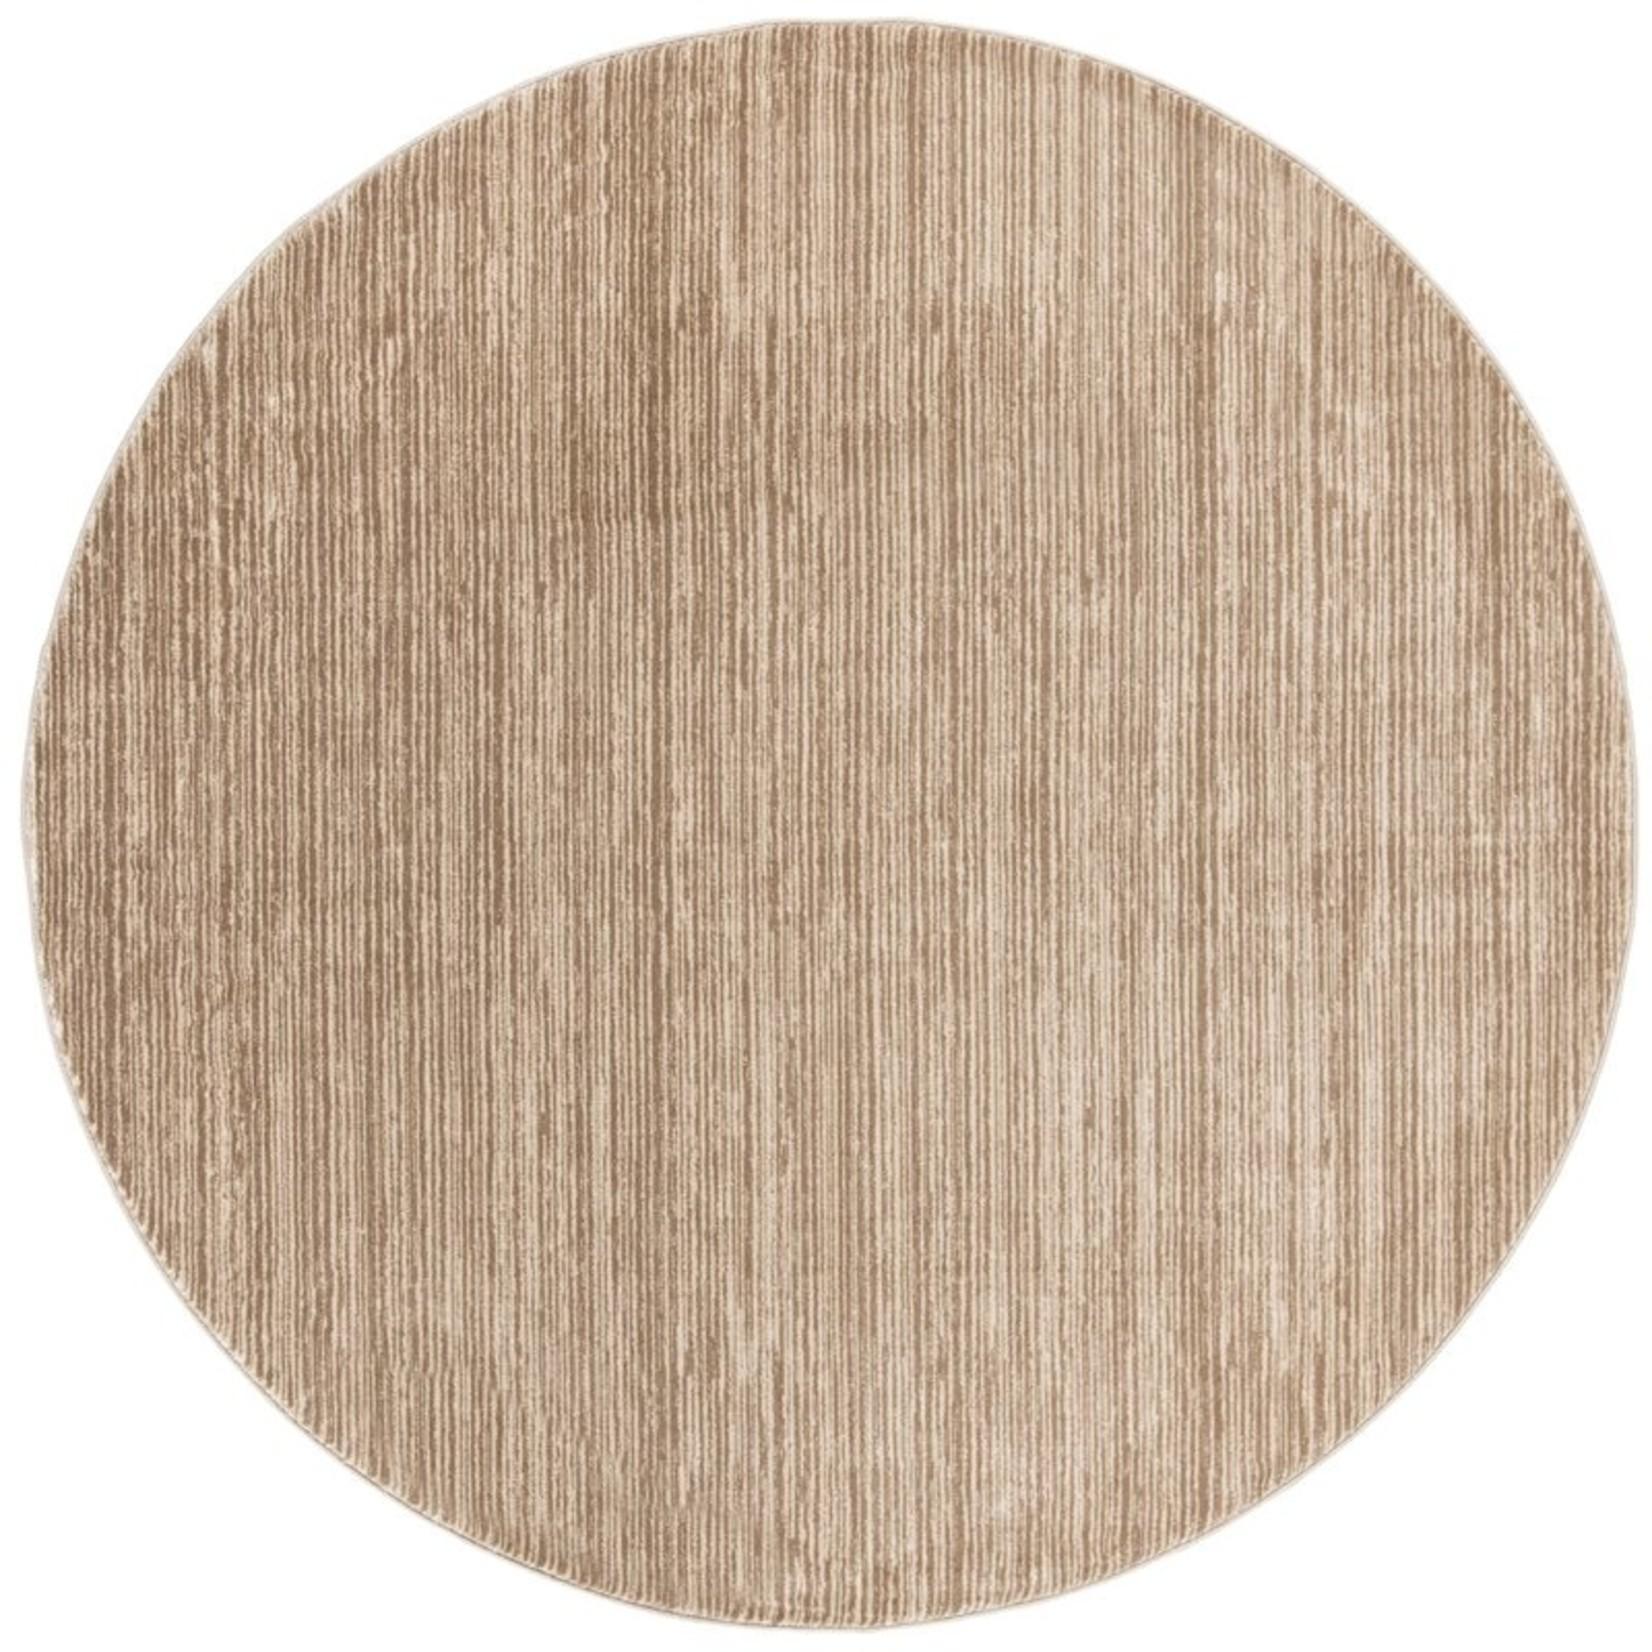 *5' Round - Harloe Light Brown Area Rug